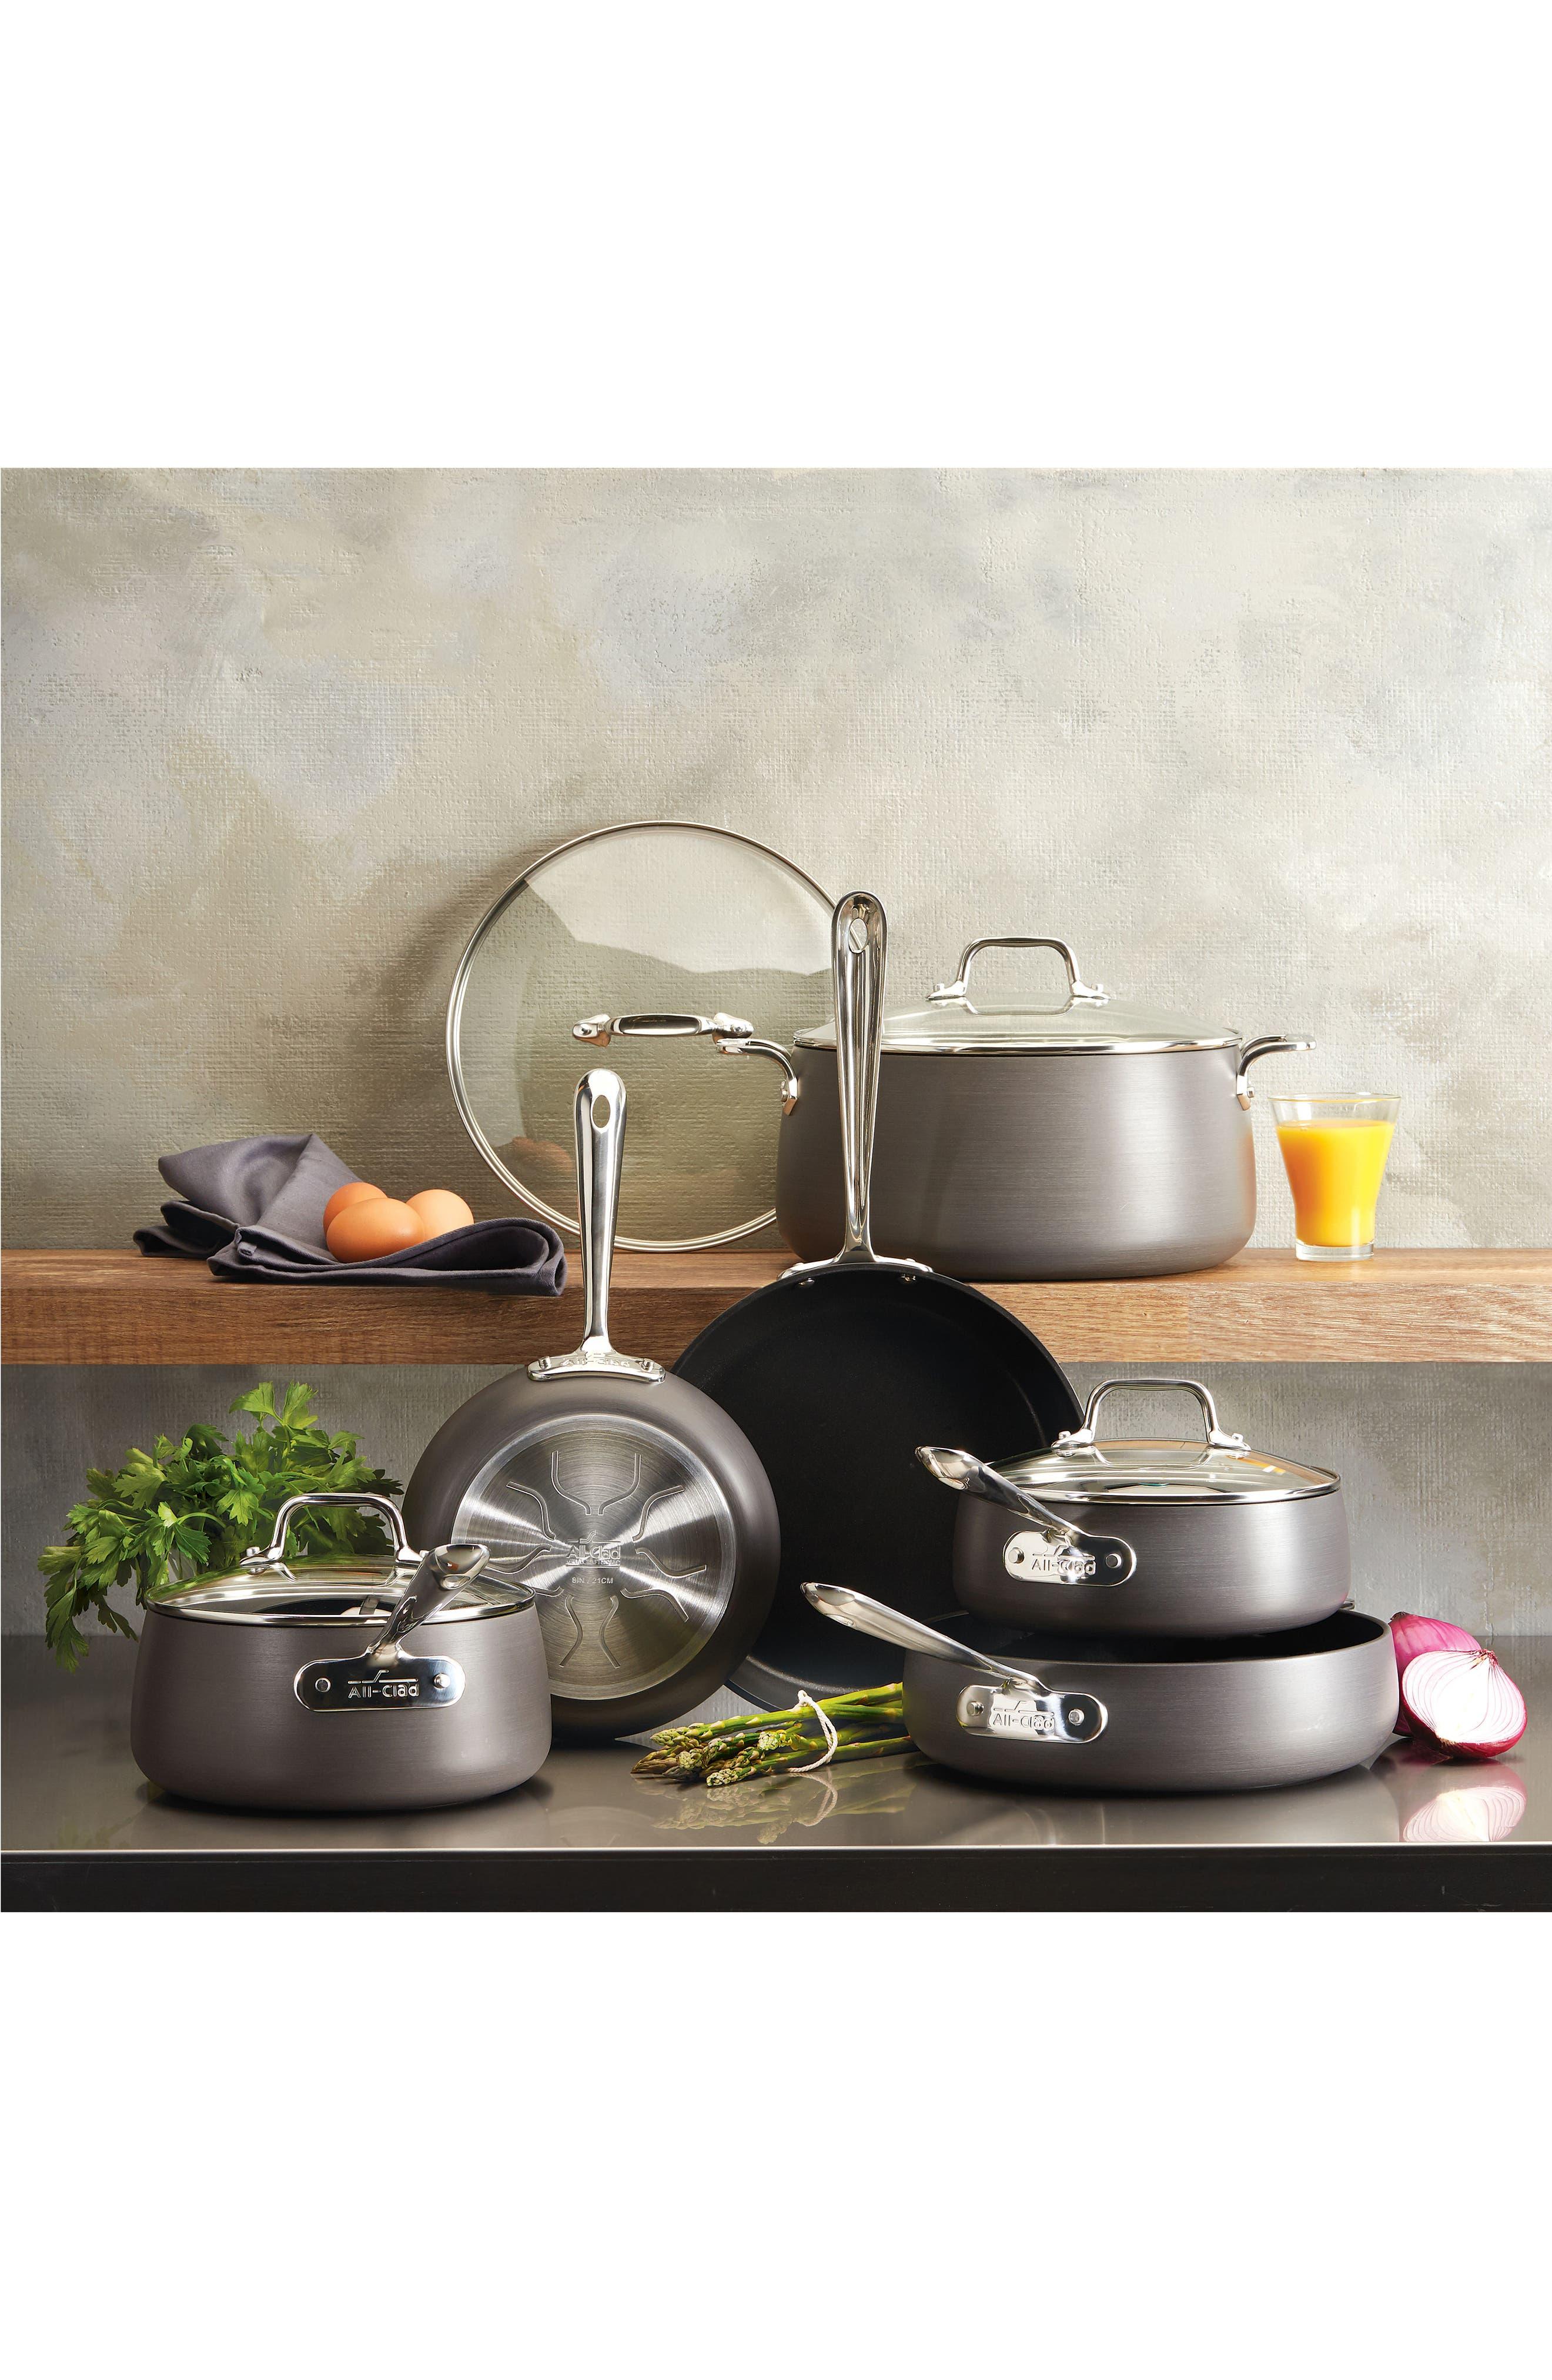 Hard Anodized 10-Piece Nonstick Cookware Set,                             Alternate thumbnail 3, color,                             040